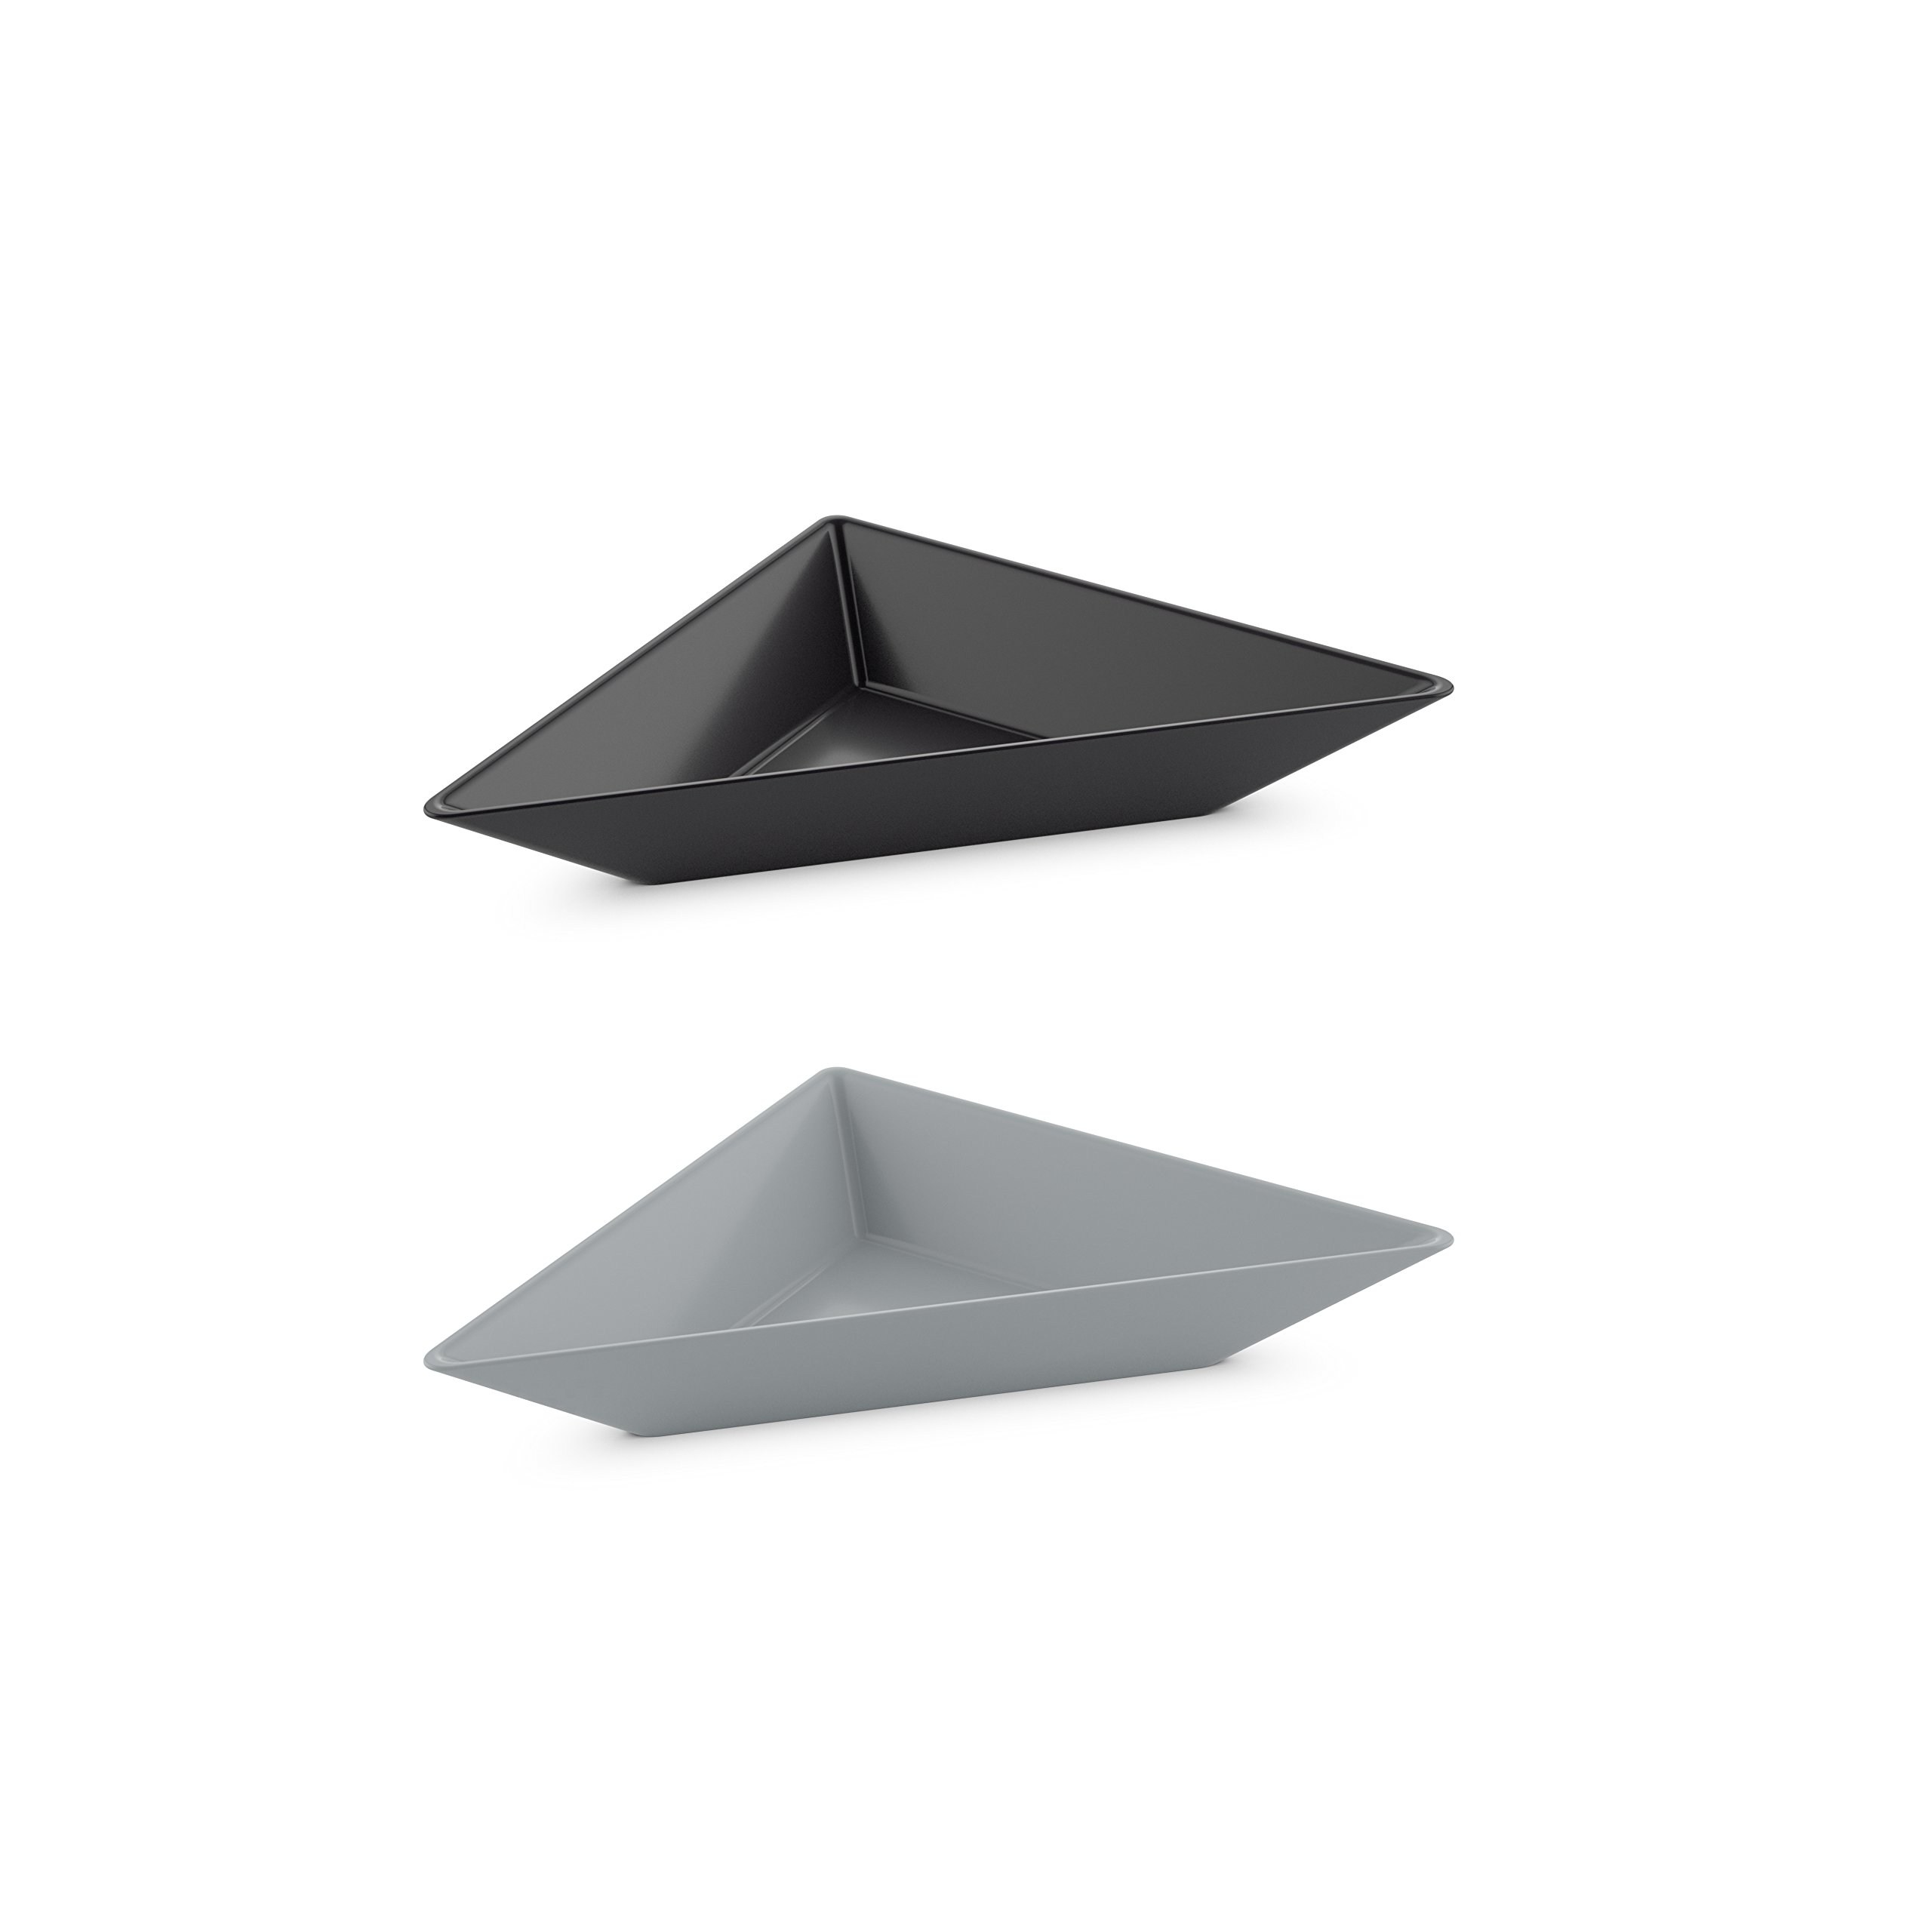 Koziol 3481412 Tangram 3'' Serving Bowl Set, One Size, Cool Grey/Cosmos Black